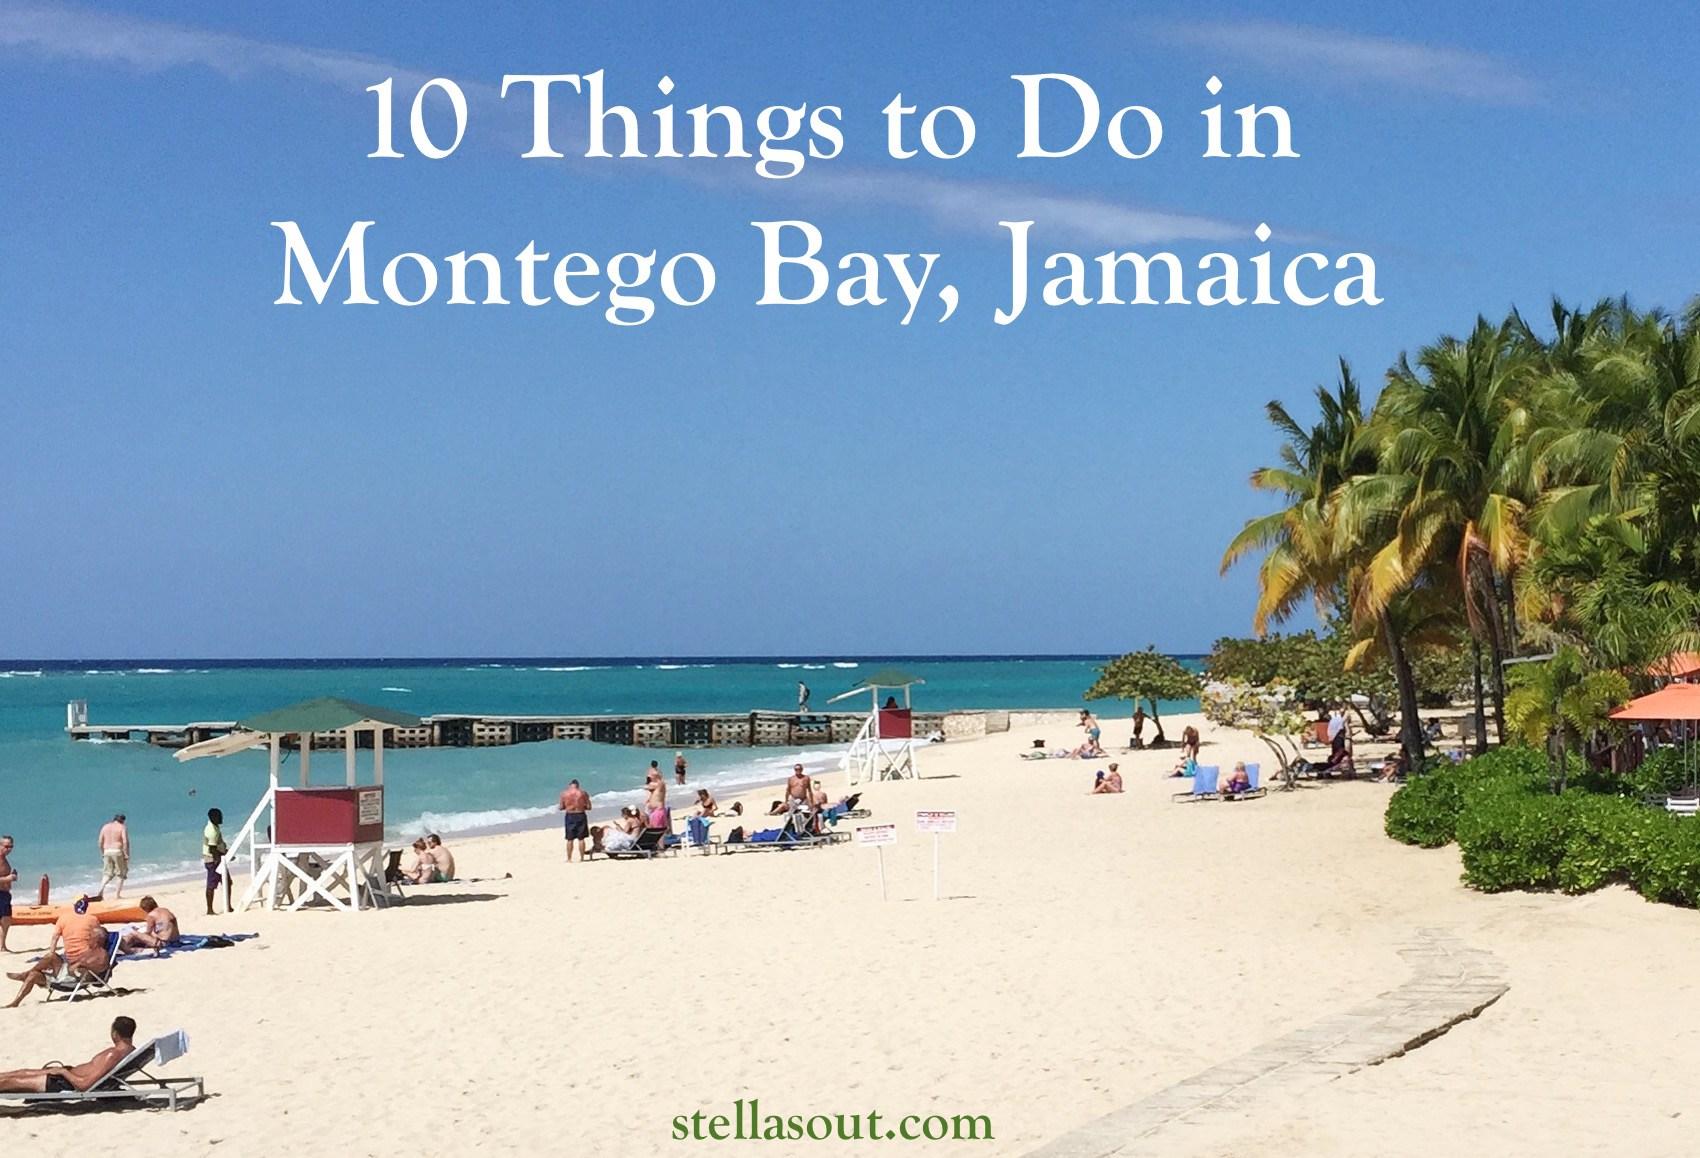 Montego bay photo